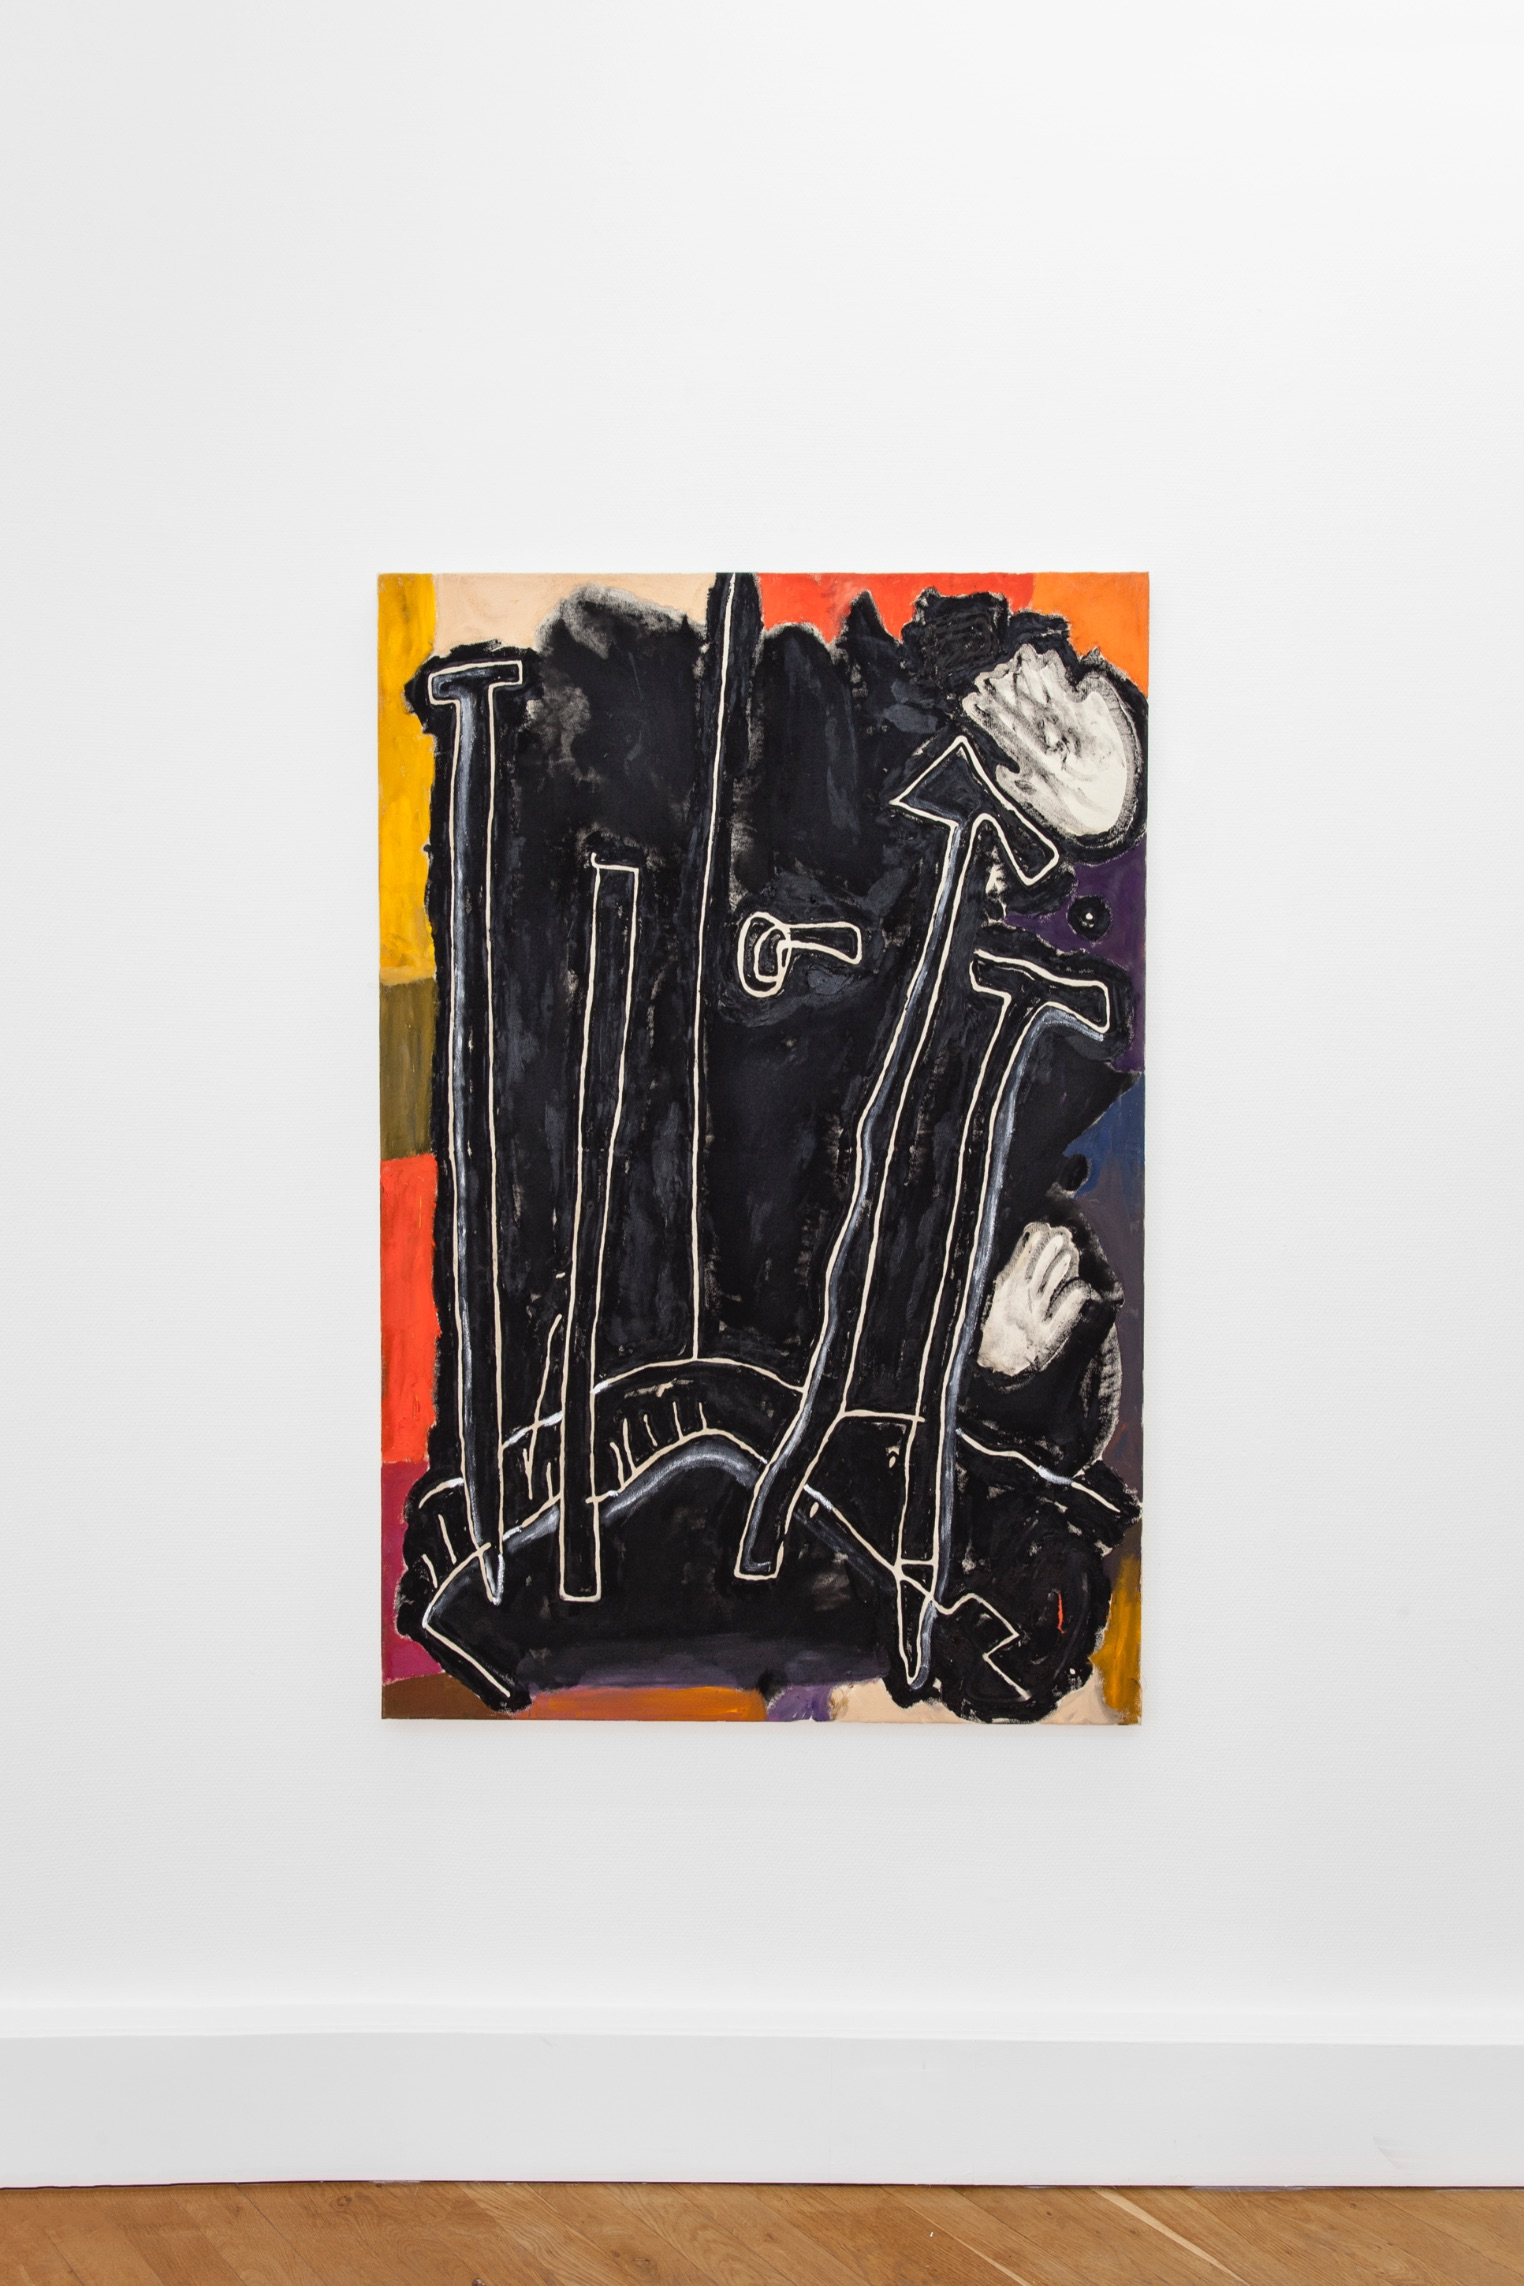 Wolfgang Voegele 3. Jailhouse Dog, oil on canvas, 150x100 cm, 2019